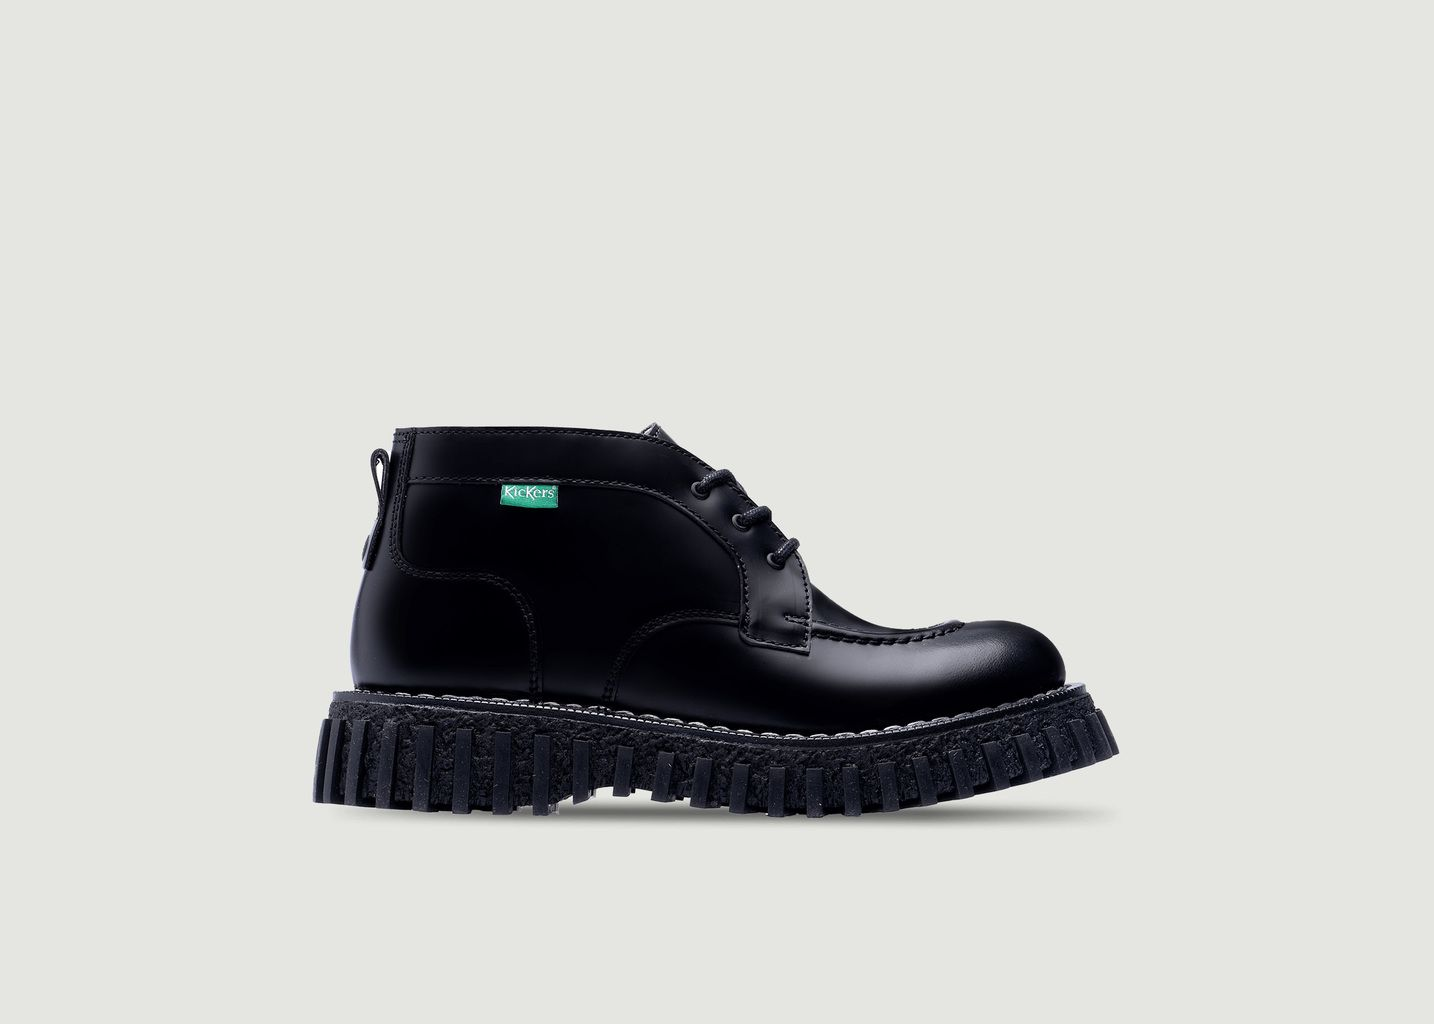 Boots en cuir Aktyon Adieu x Kickers - Adieu